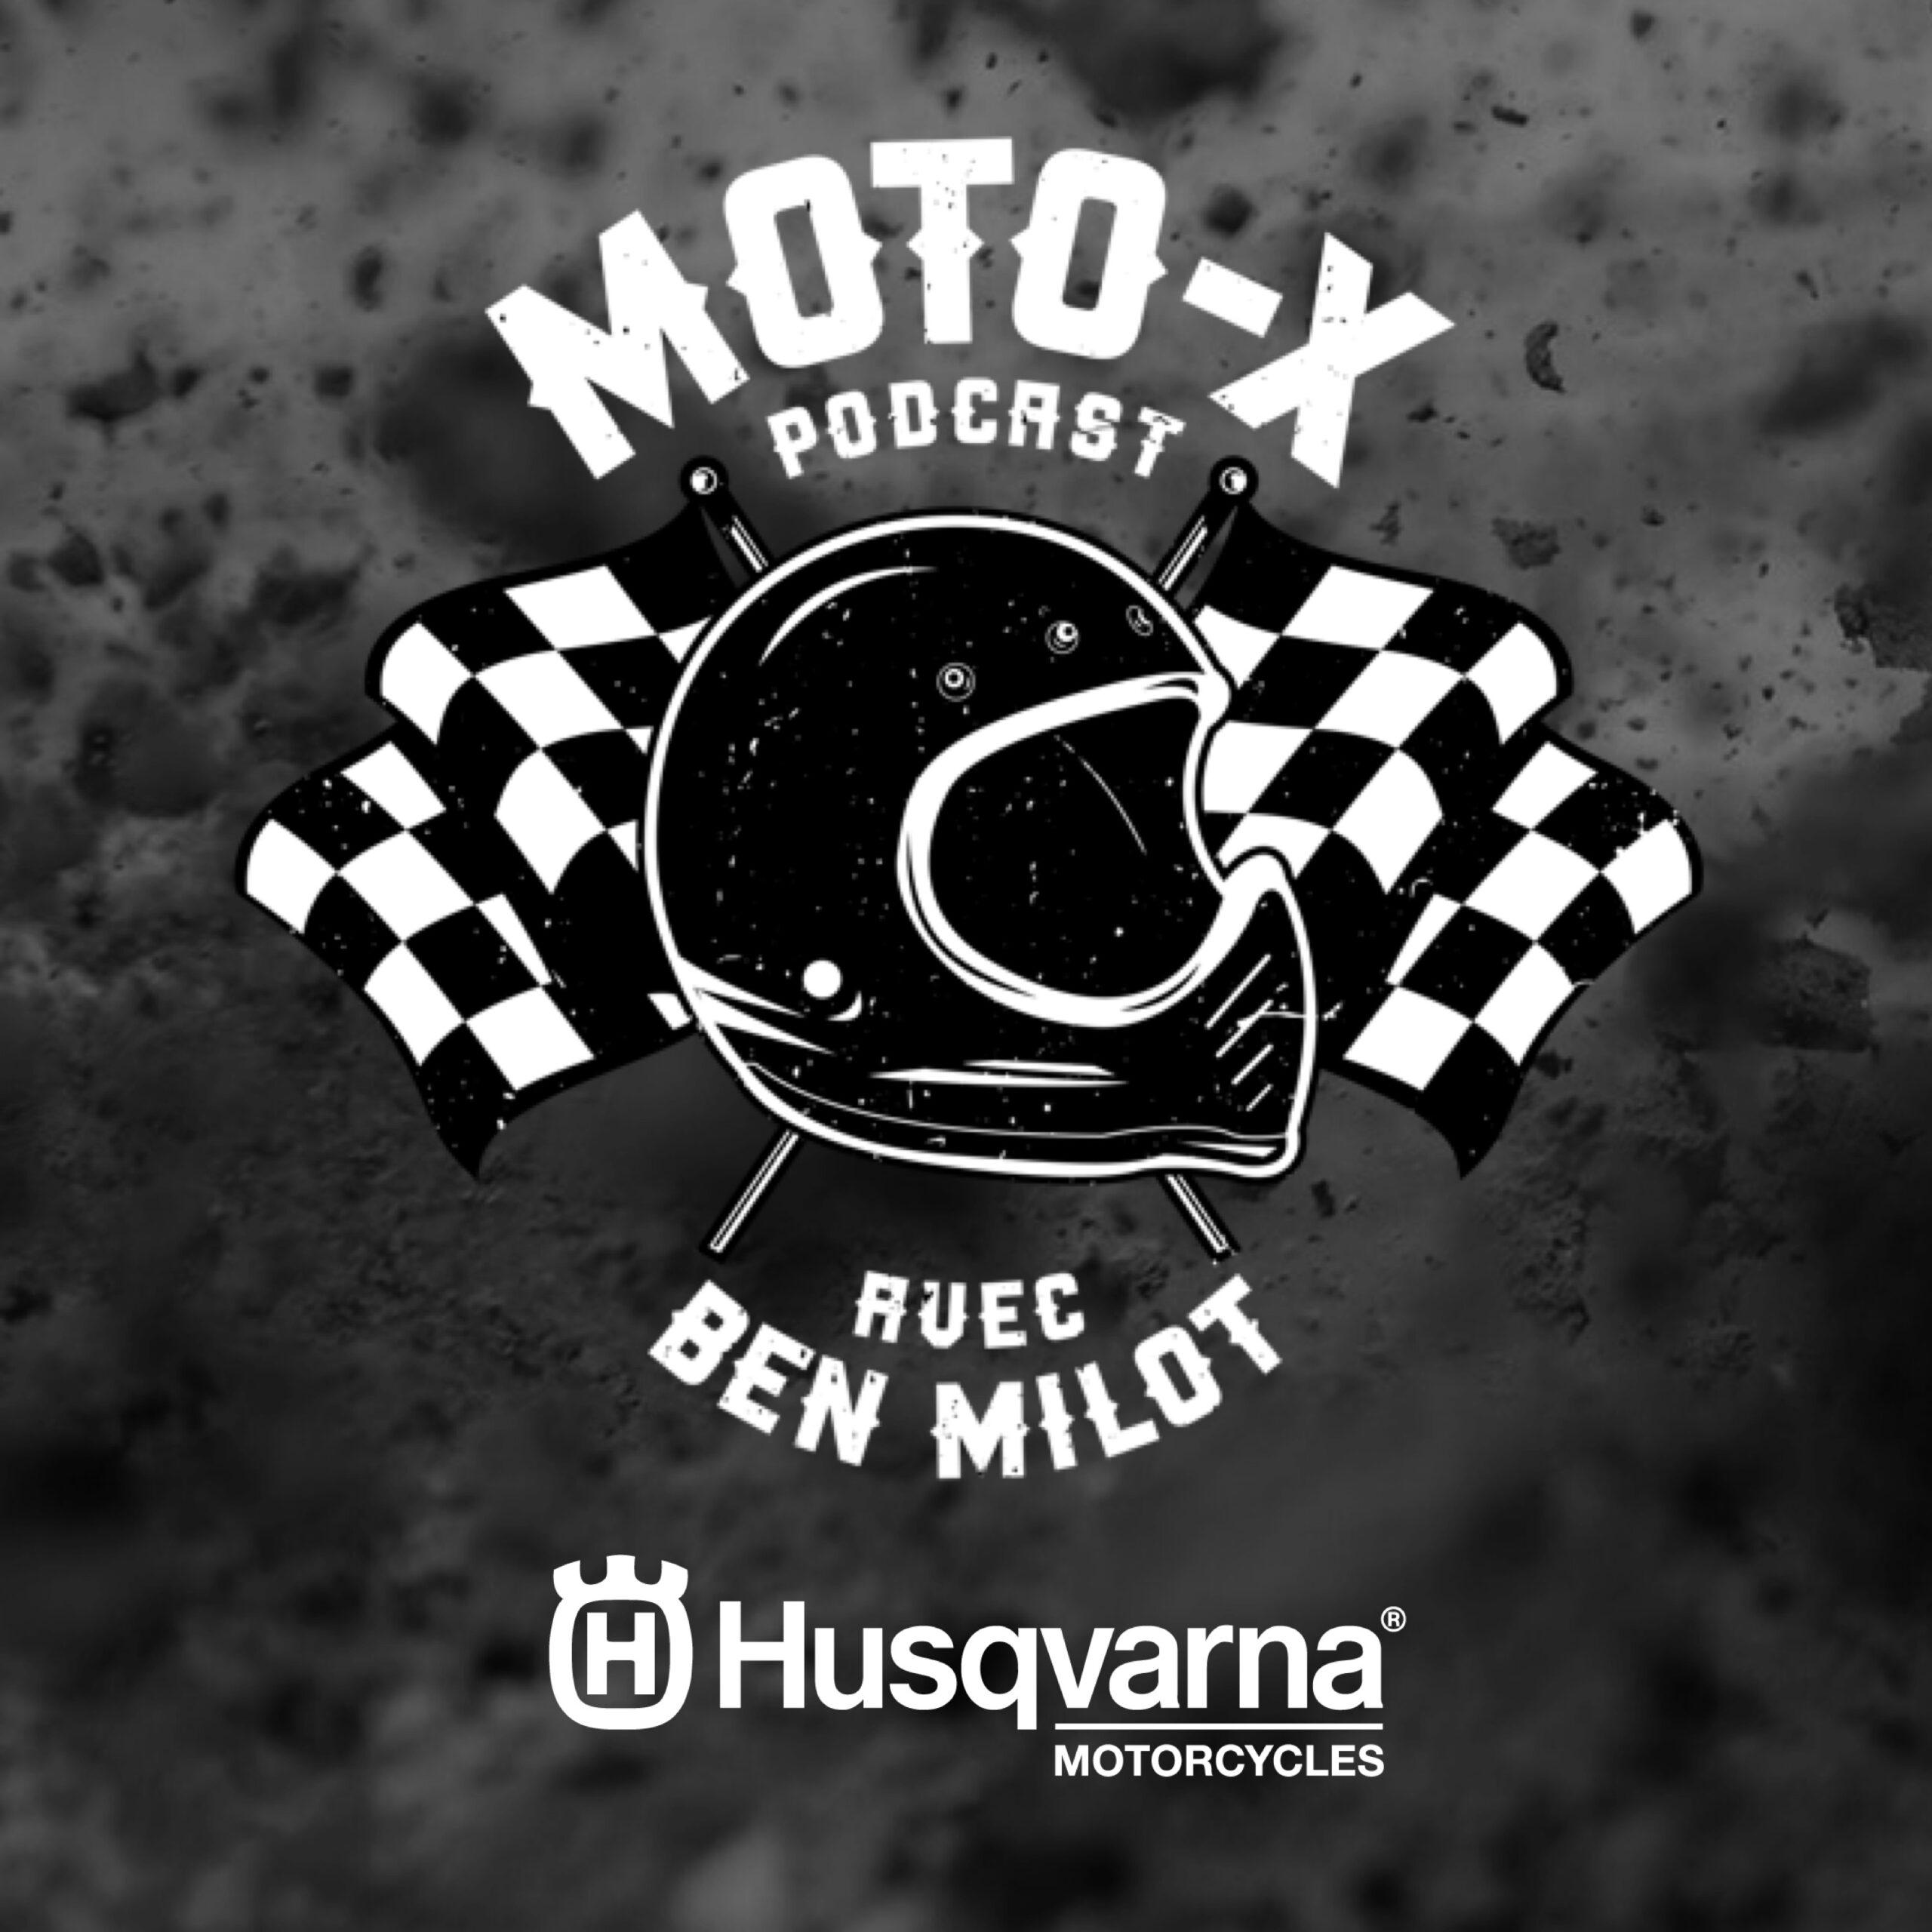 Moto-X Podcast avec Ben Milot